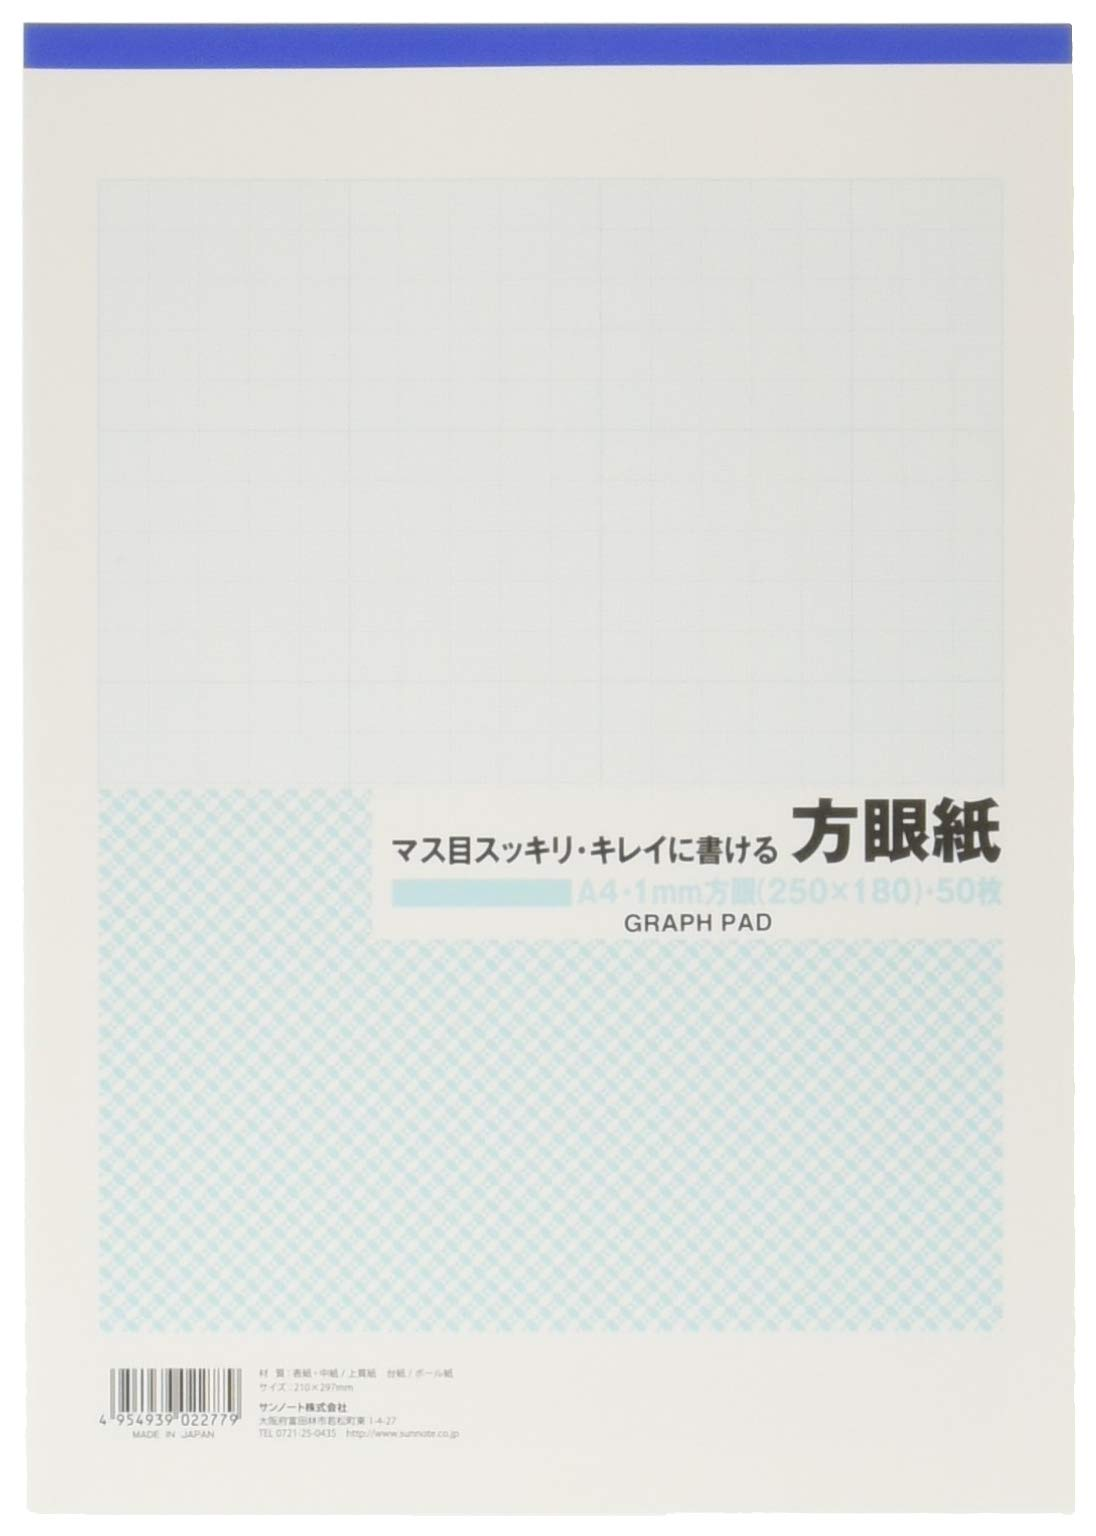 San notebook graph paper 549 A4 size 1mm grid 10 books set